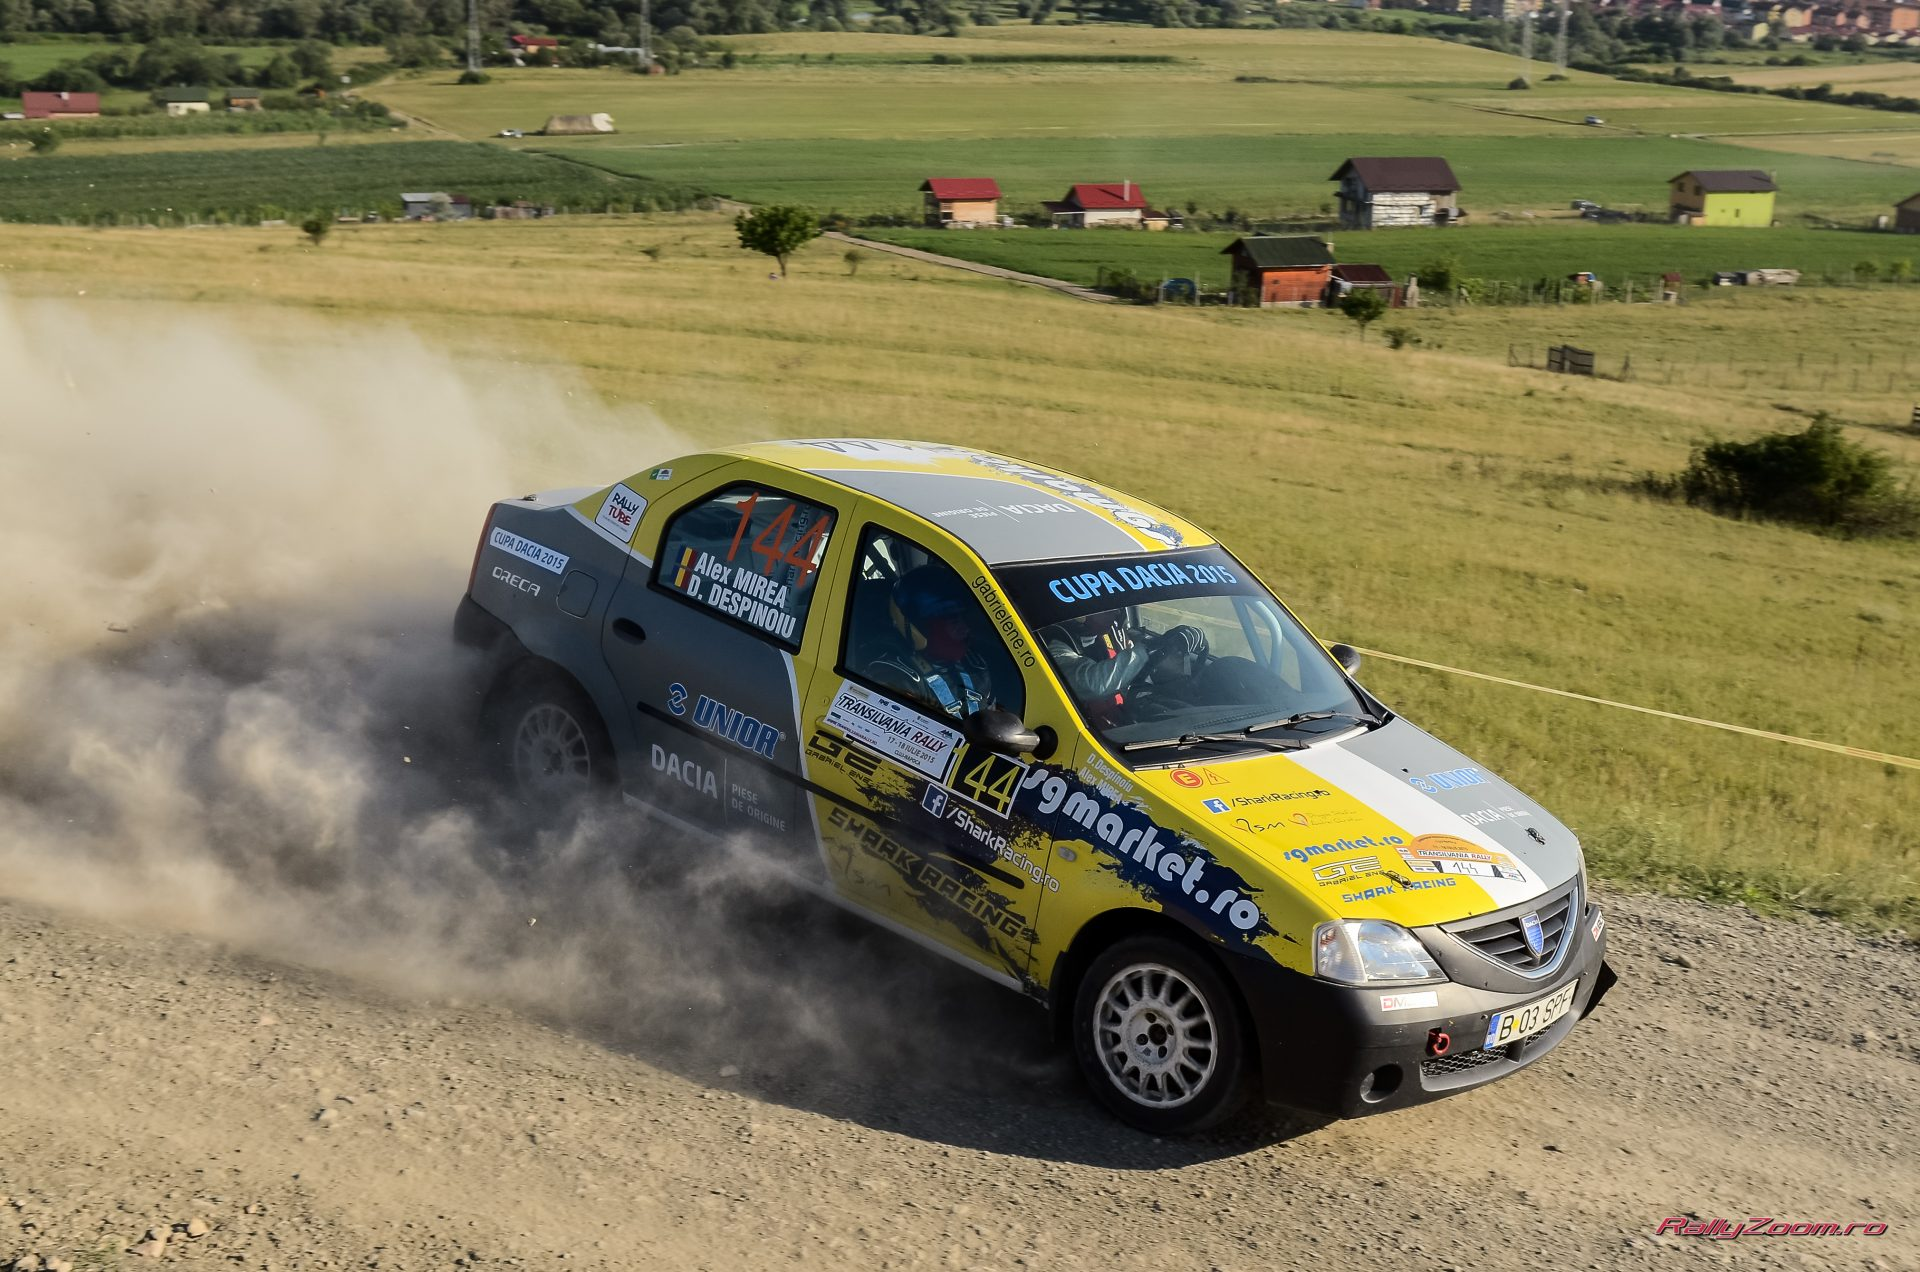 Cupa DACIA 2015 ? Victorie pentru Alex Mirea in etapa a 5-a Transilvania Rally